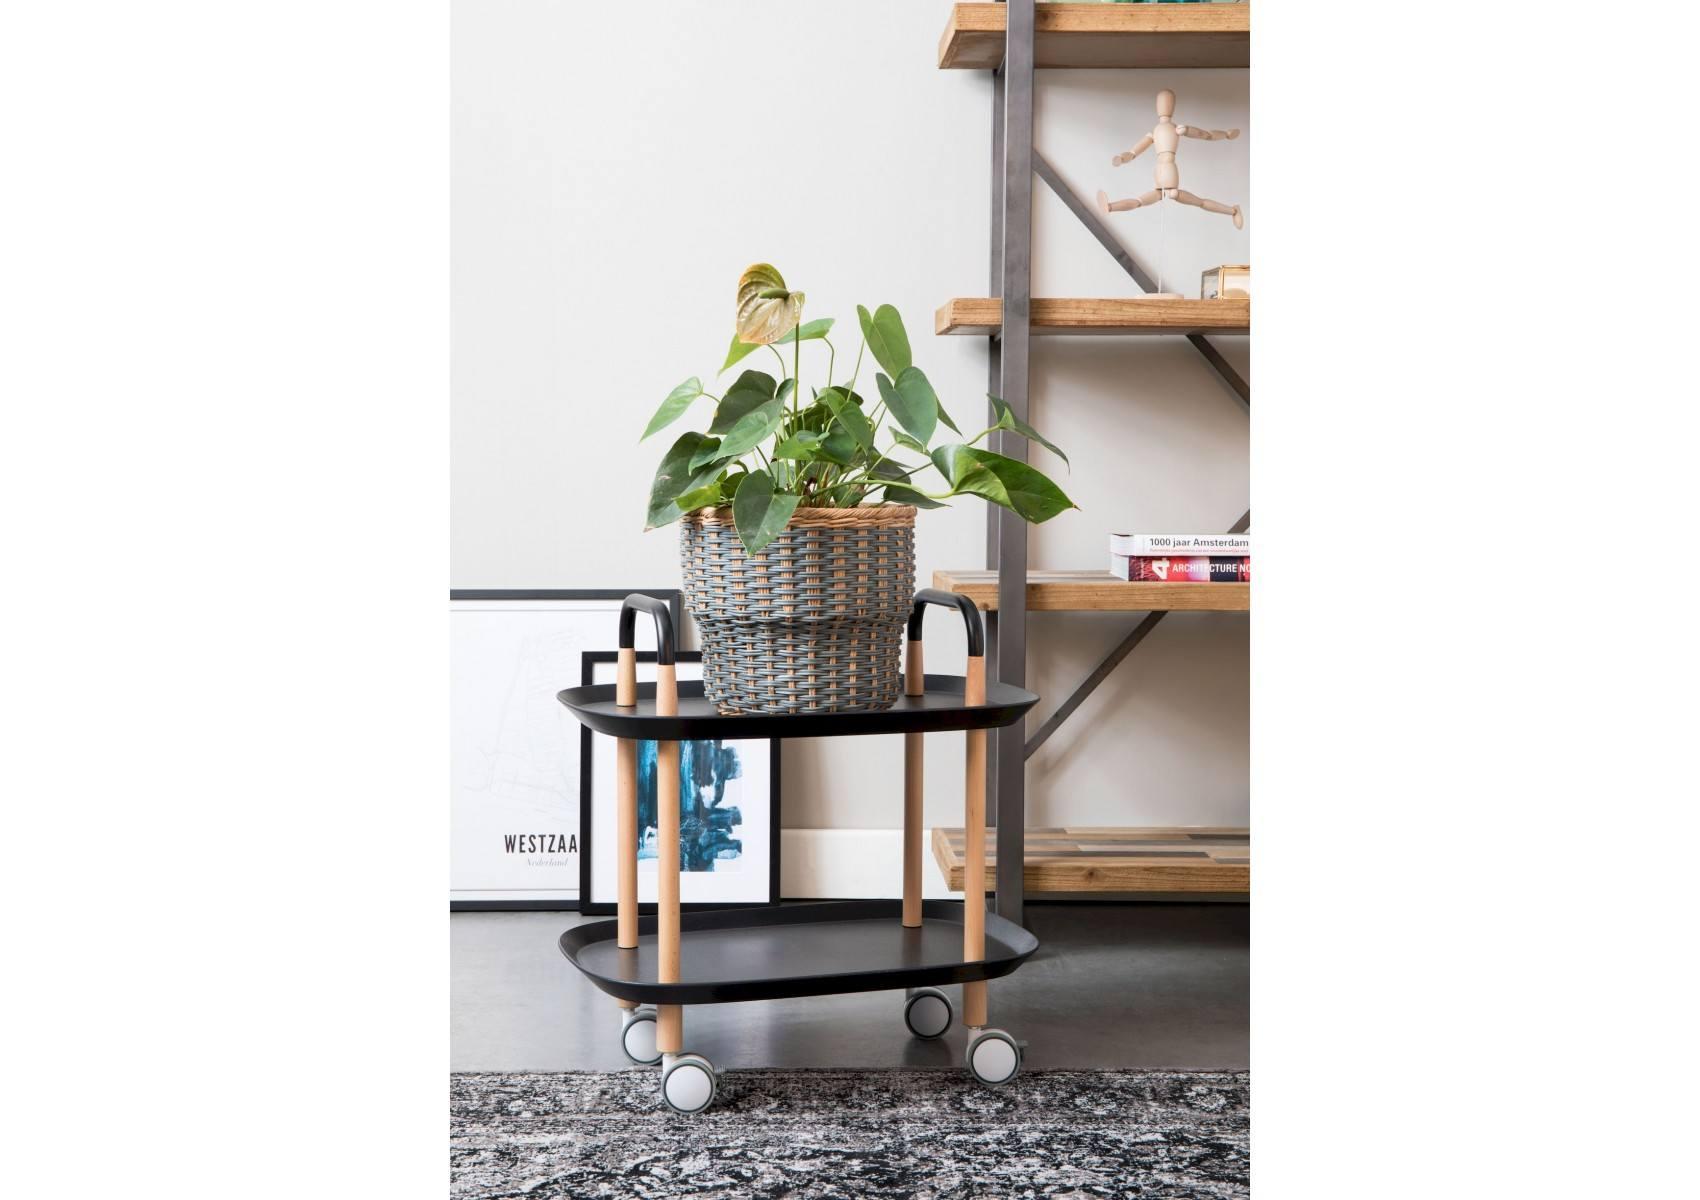 desserte cruiser en bois et m tal sur roulettes boite design. Black Bedroom Furniture Sets. Home Design Ideas